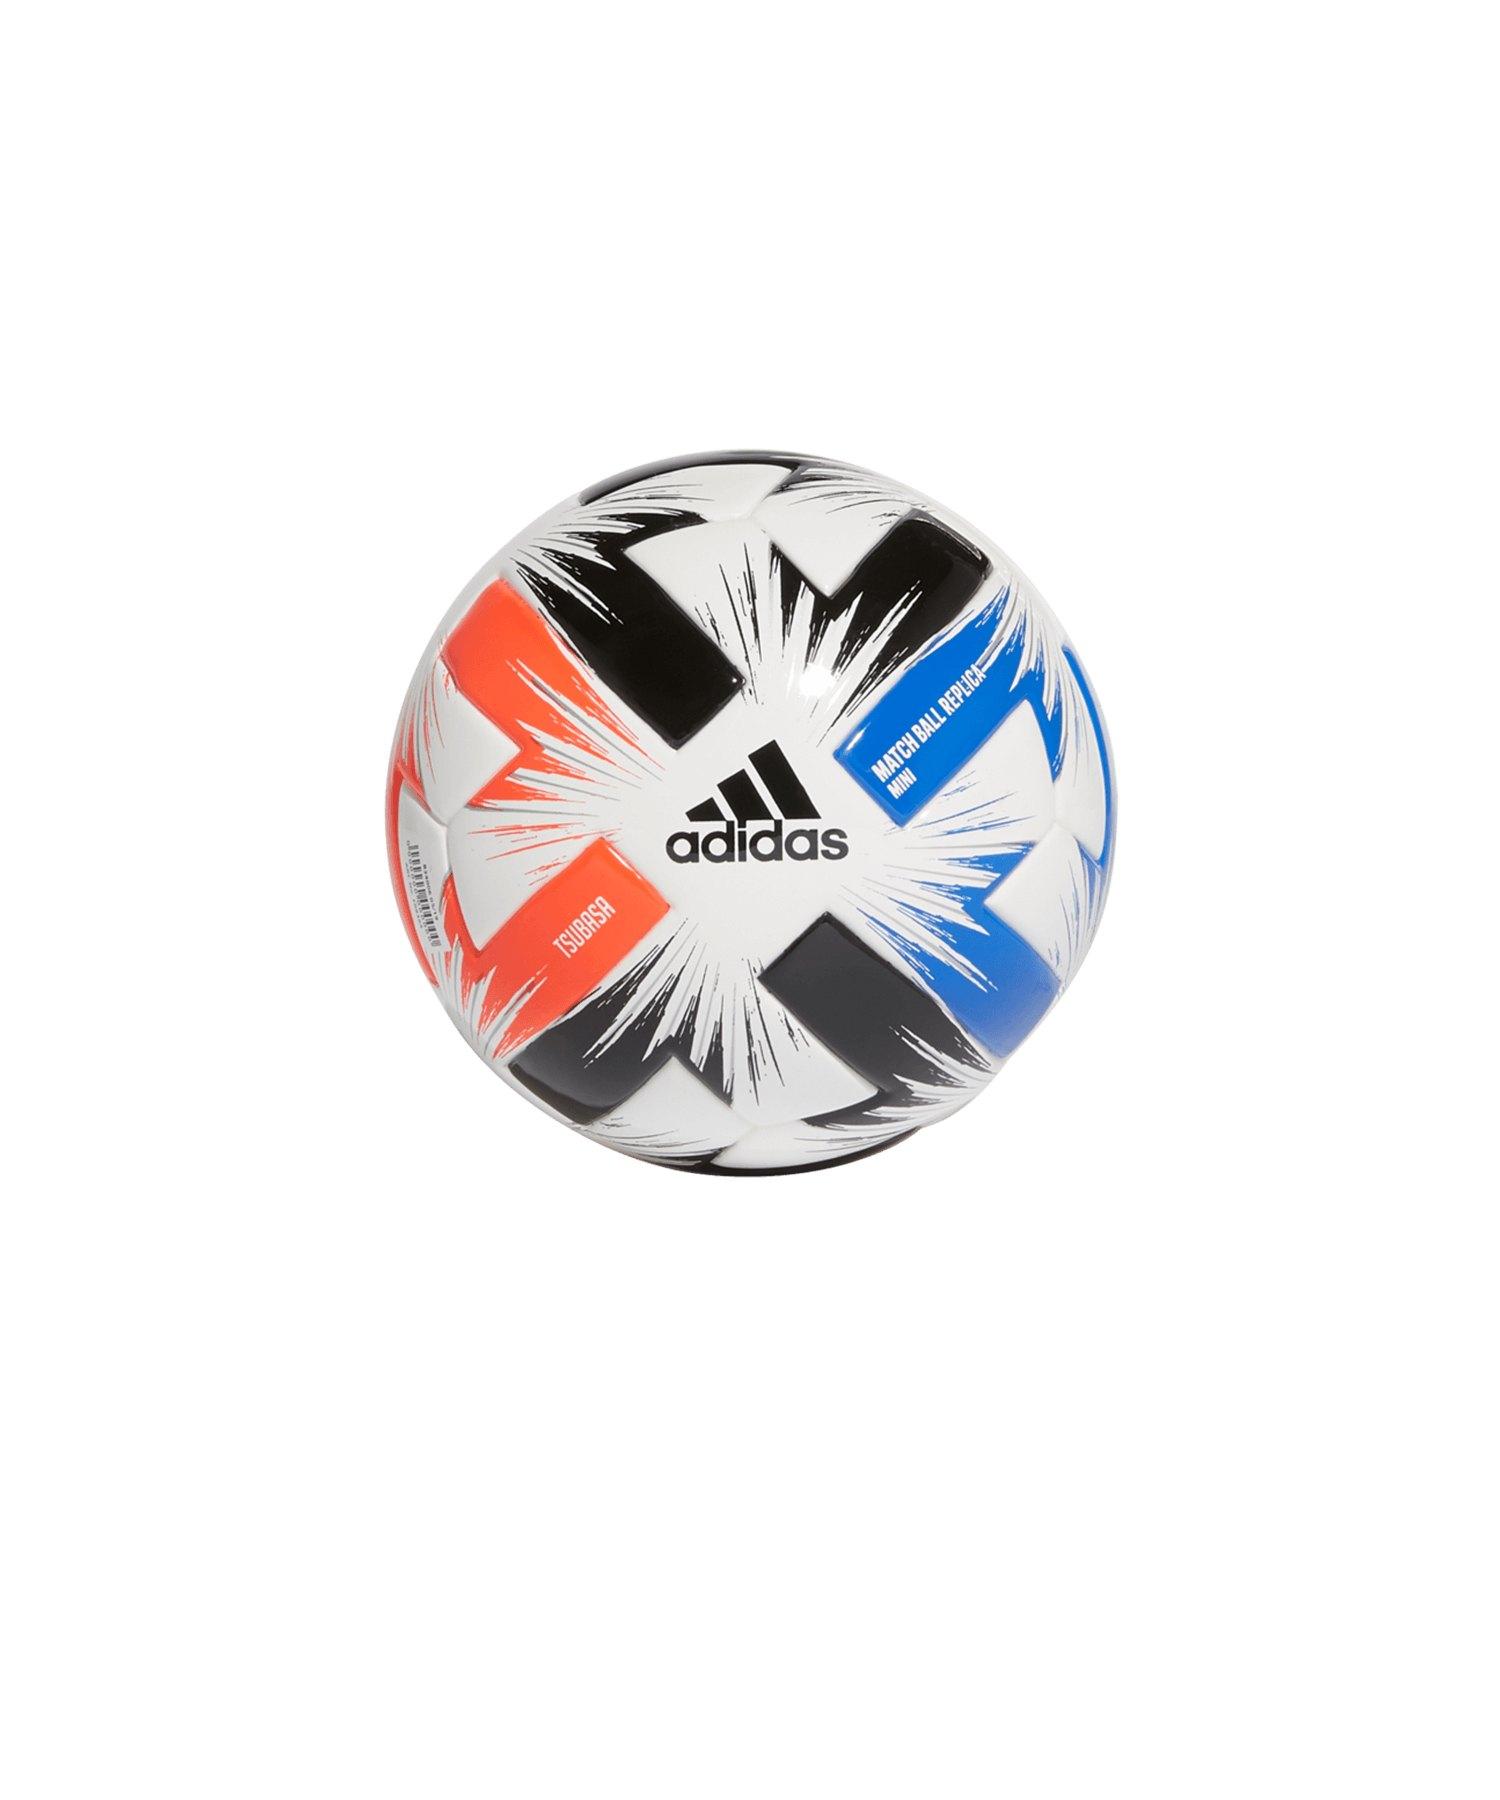 adidas Tsubasa Miniball Weiss Rot Blau - rot